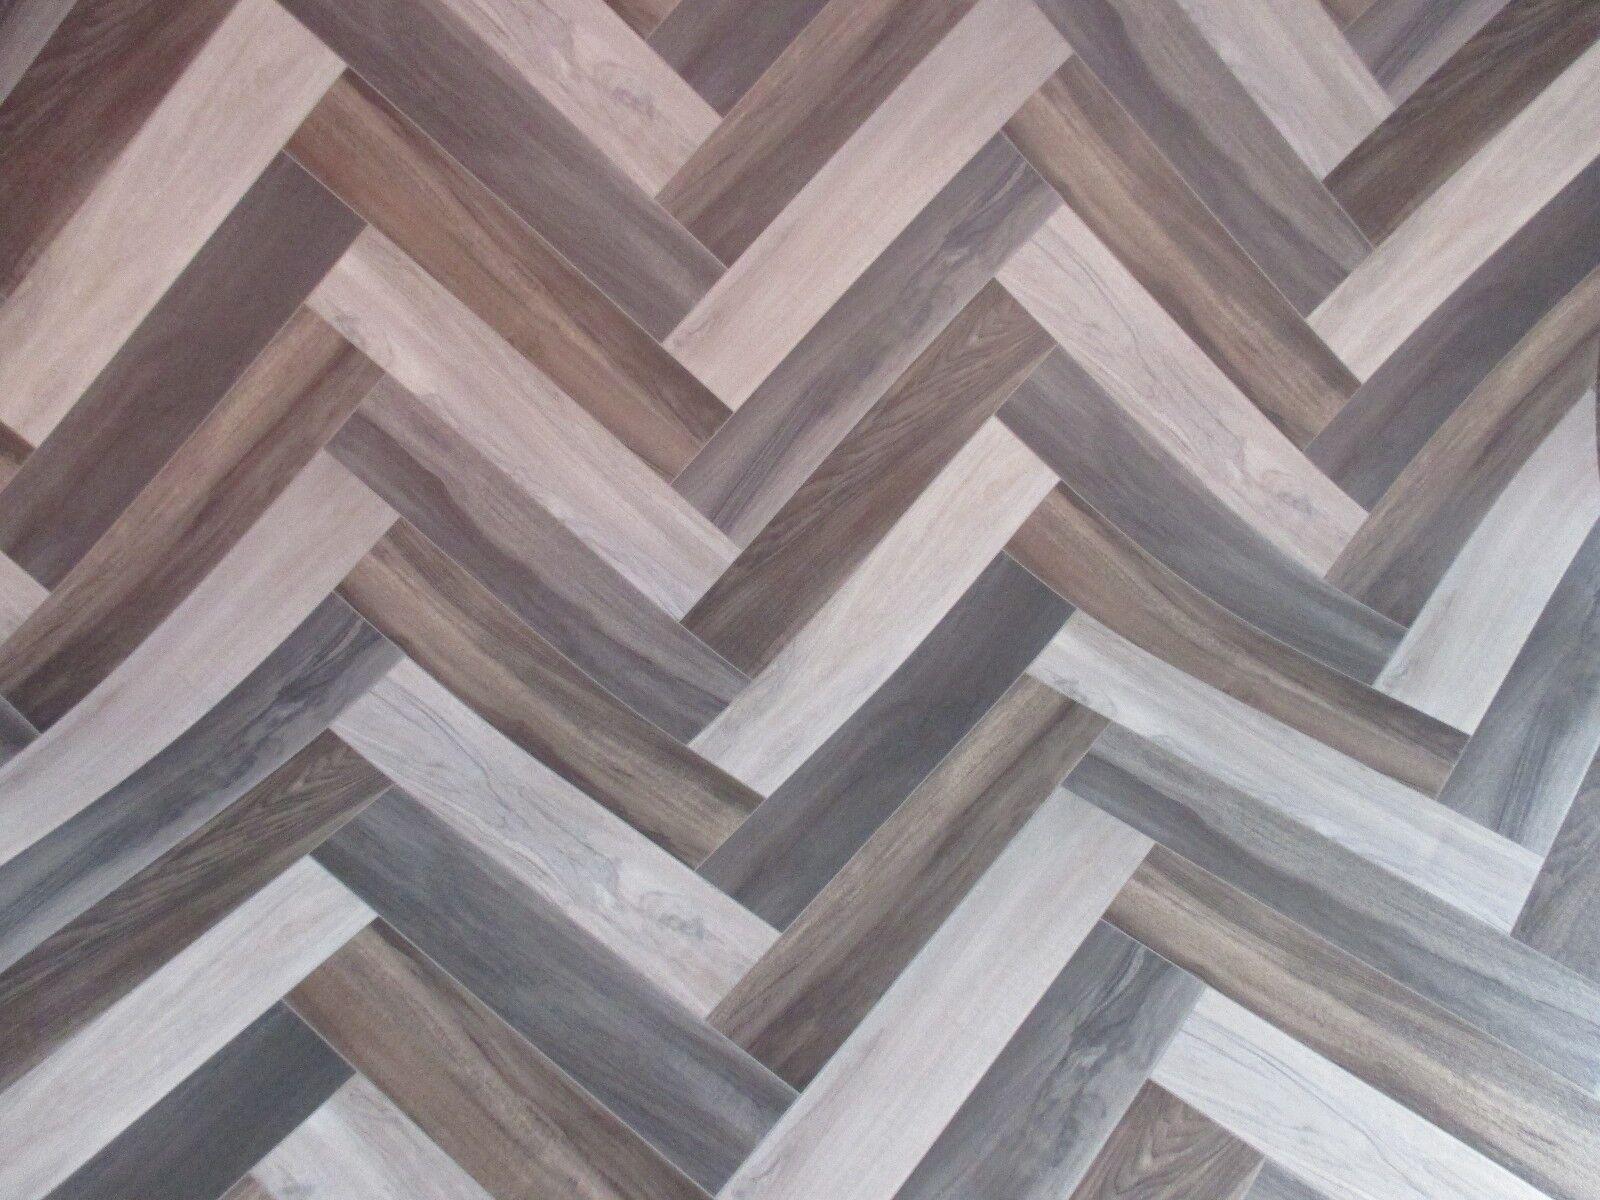 PVC (  m²) CV Bodenbelag Holz Mehrfarbig Trent Venice Optik 2 Meter breite